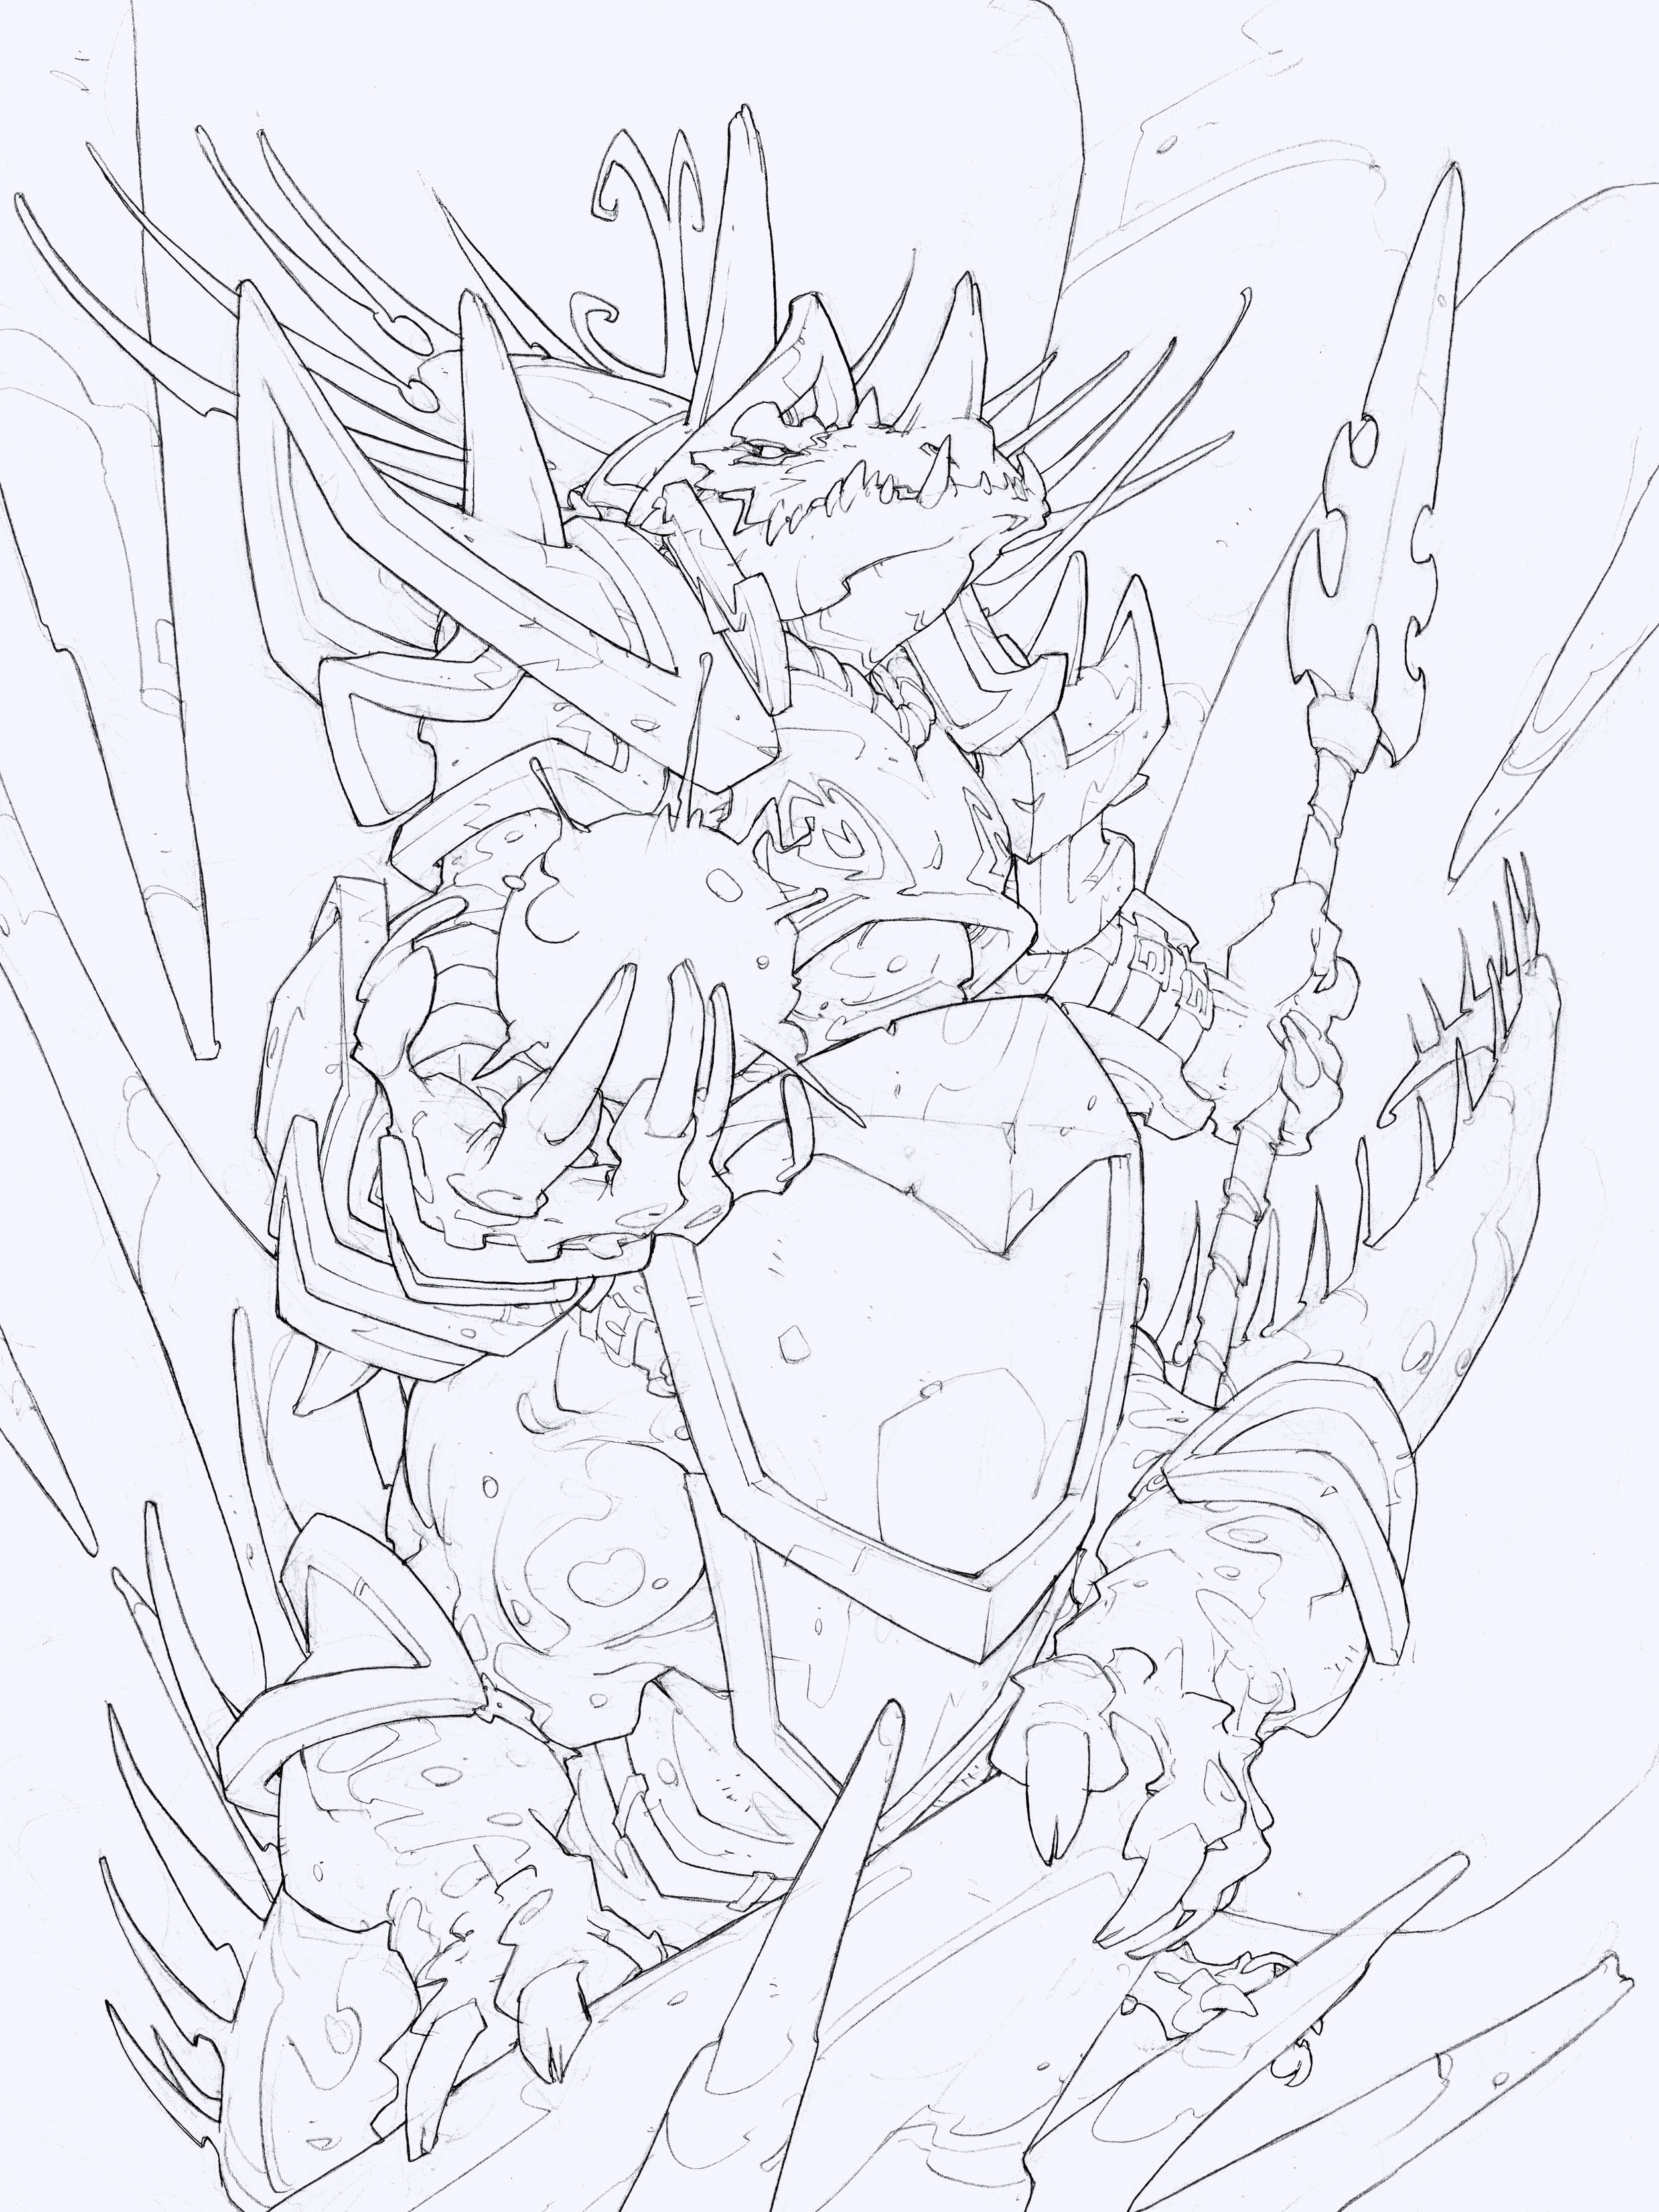 Blizzard Entertainment | Hearthstone - Dragonkin Sorcerer | Edouard Guiton